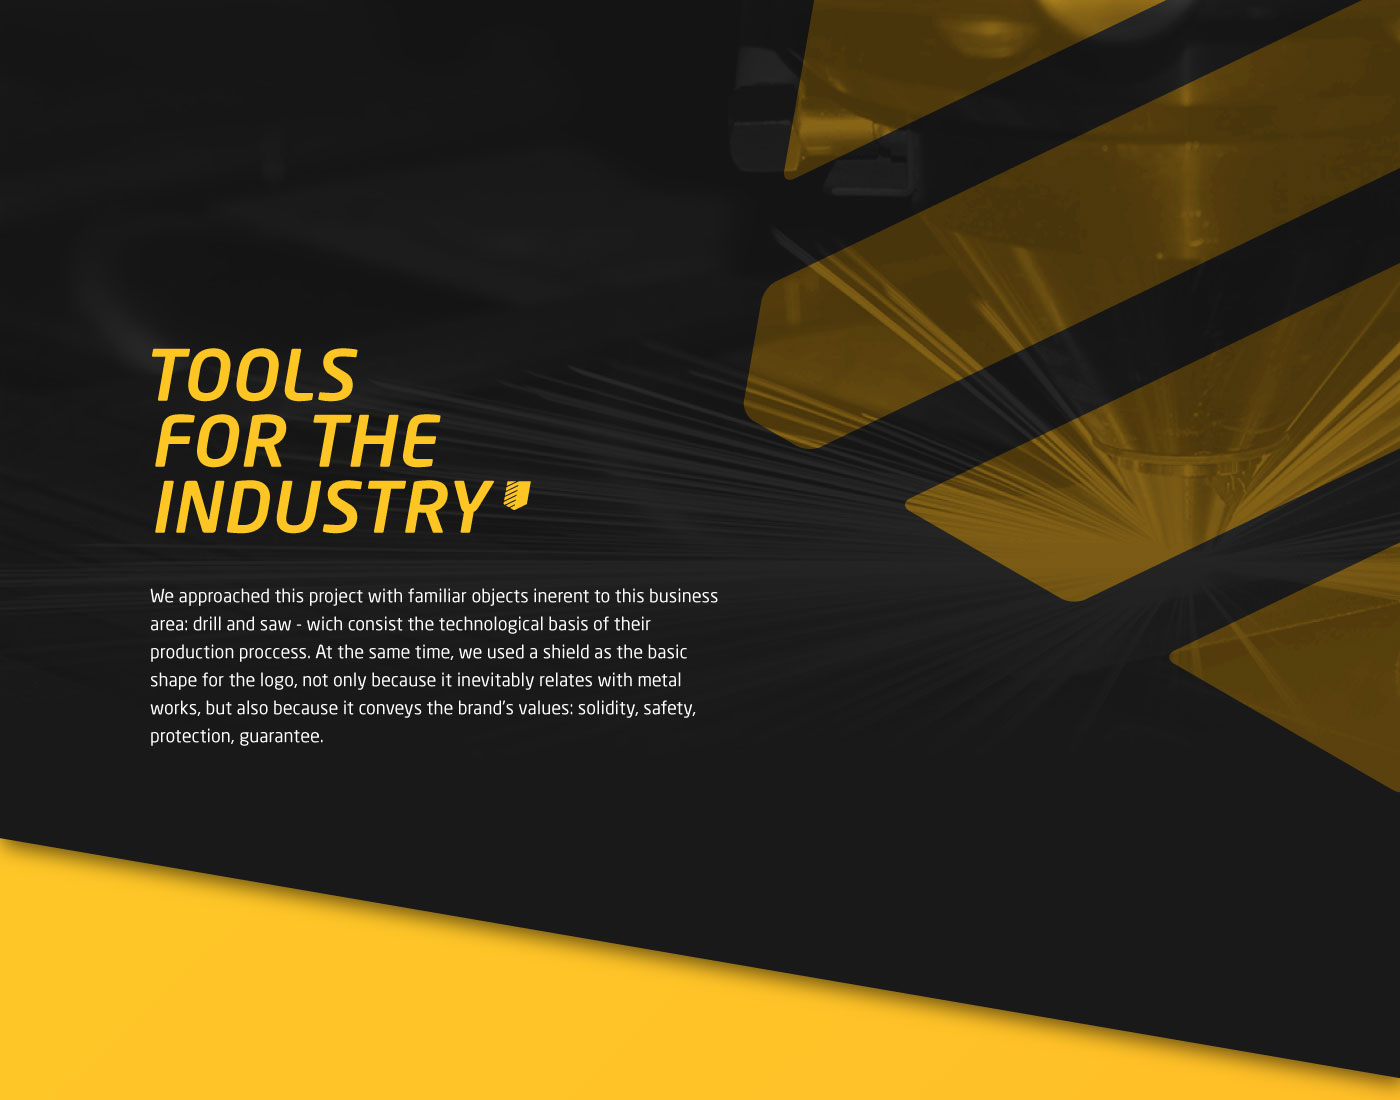 tools itg industry yellow black stationary shield metalwork metal cut SAW drill